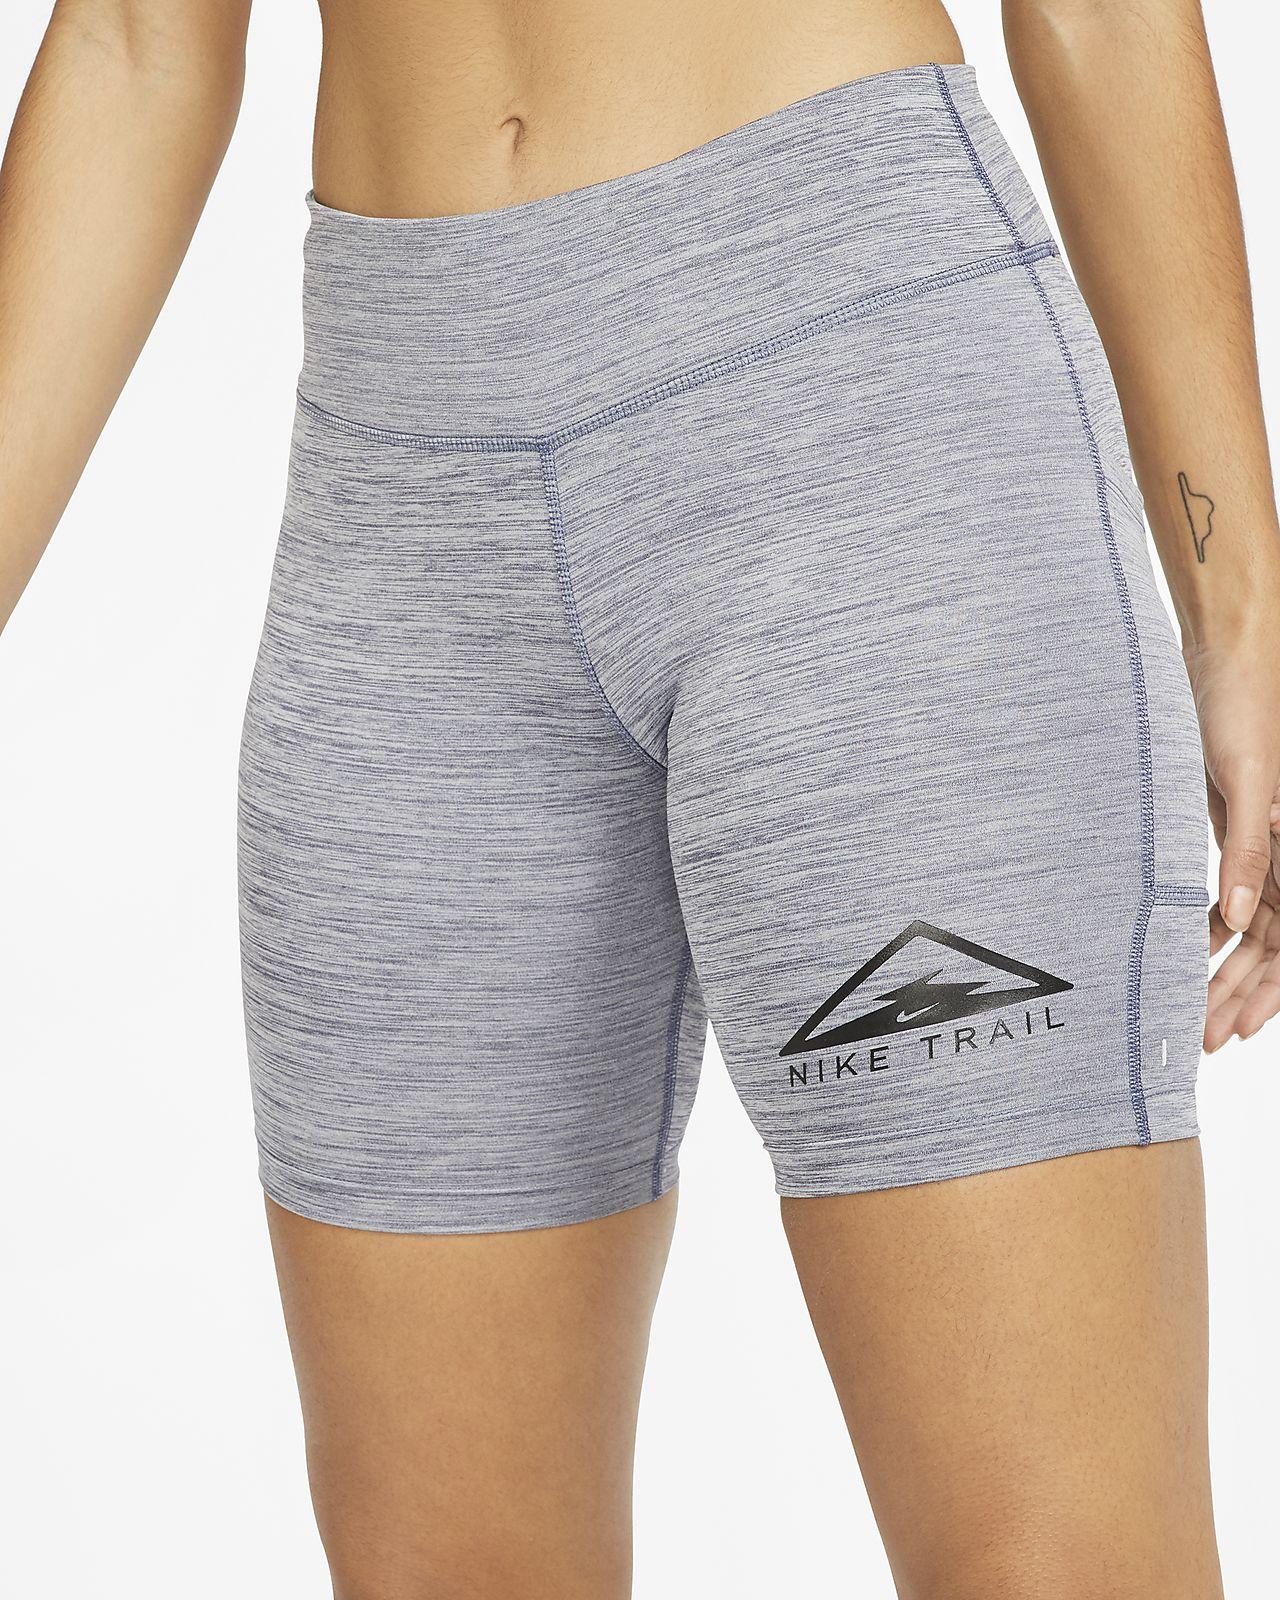 Nike Fast Trail-Laufshorts für Damen (ca. 18 cm)